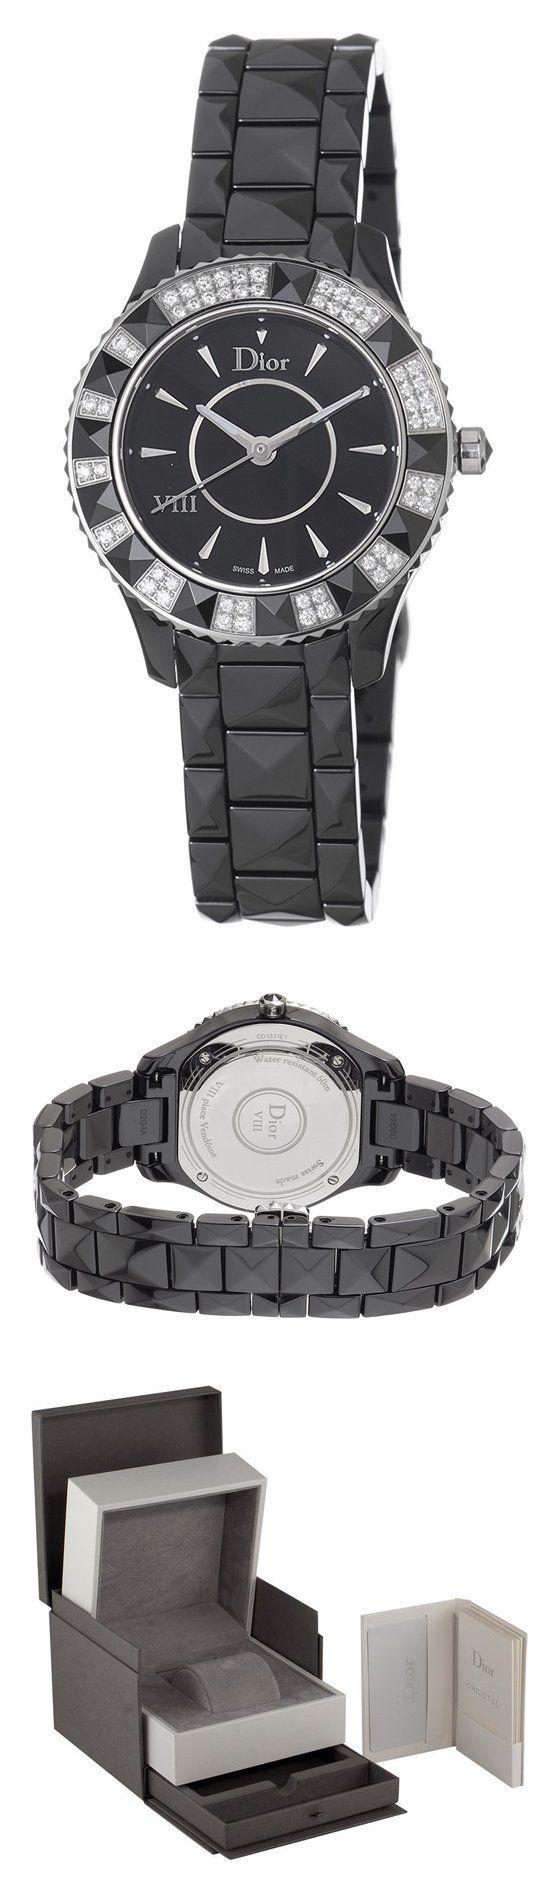 Christian Dior Women's CD1231E1C001 Black Eight Analog Display Swiss Quartz Black Watch #watch #christiandior #wrist_watches #watches #women #departments #shops